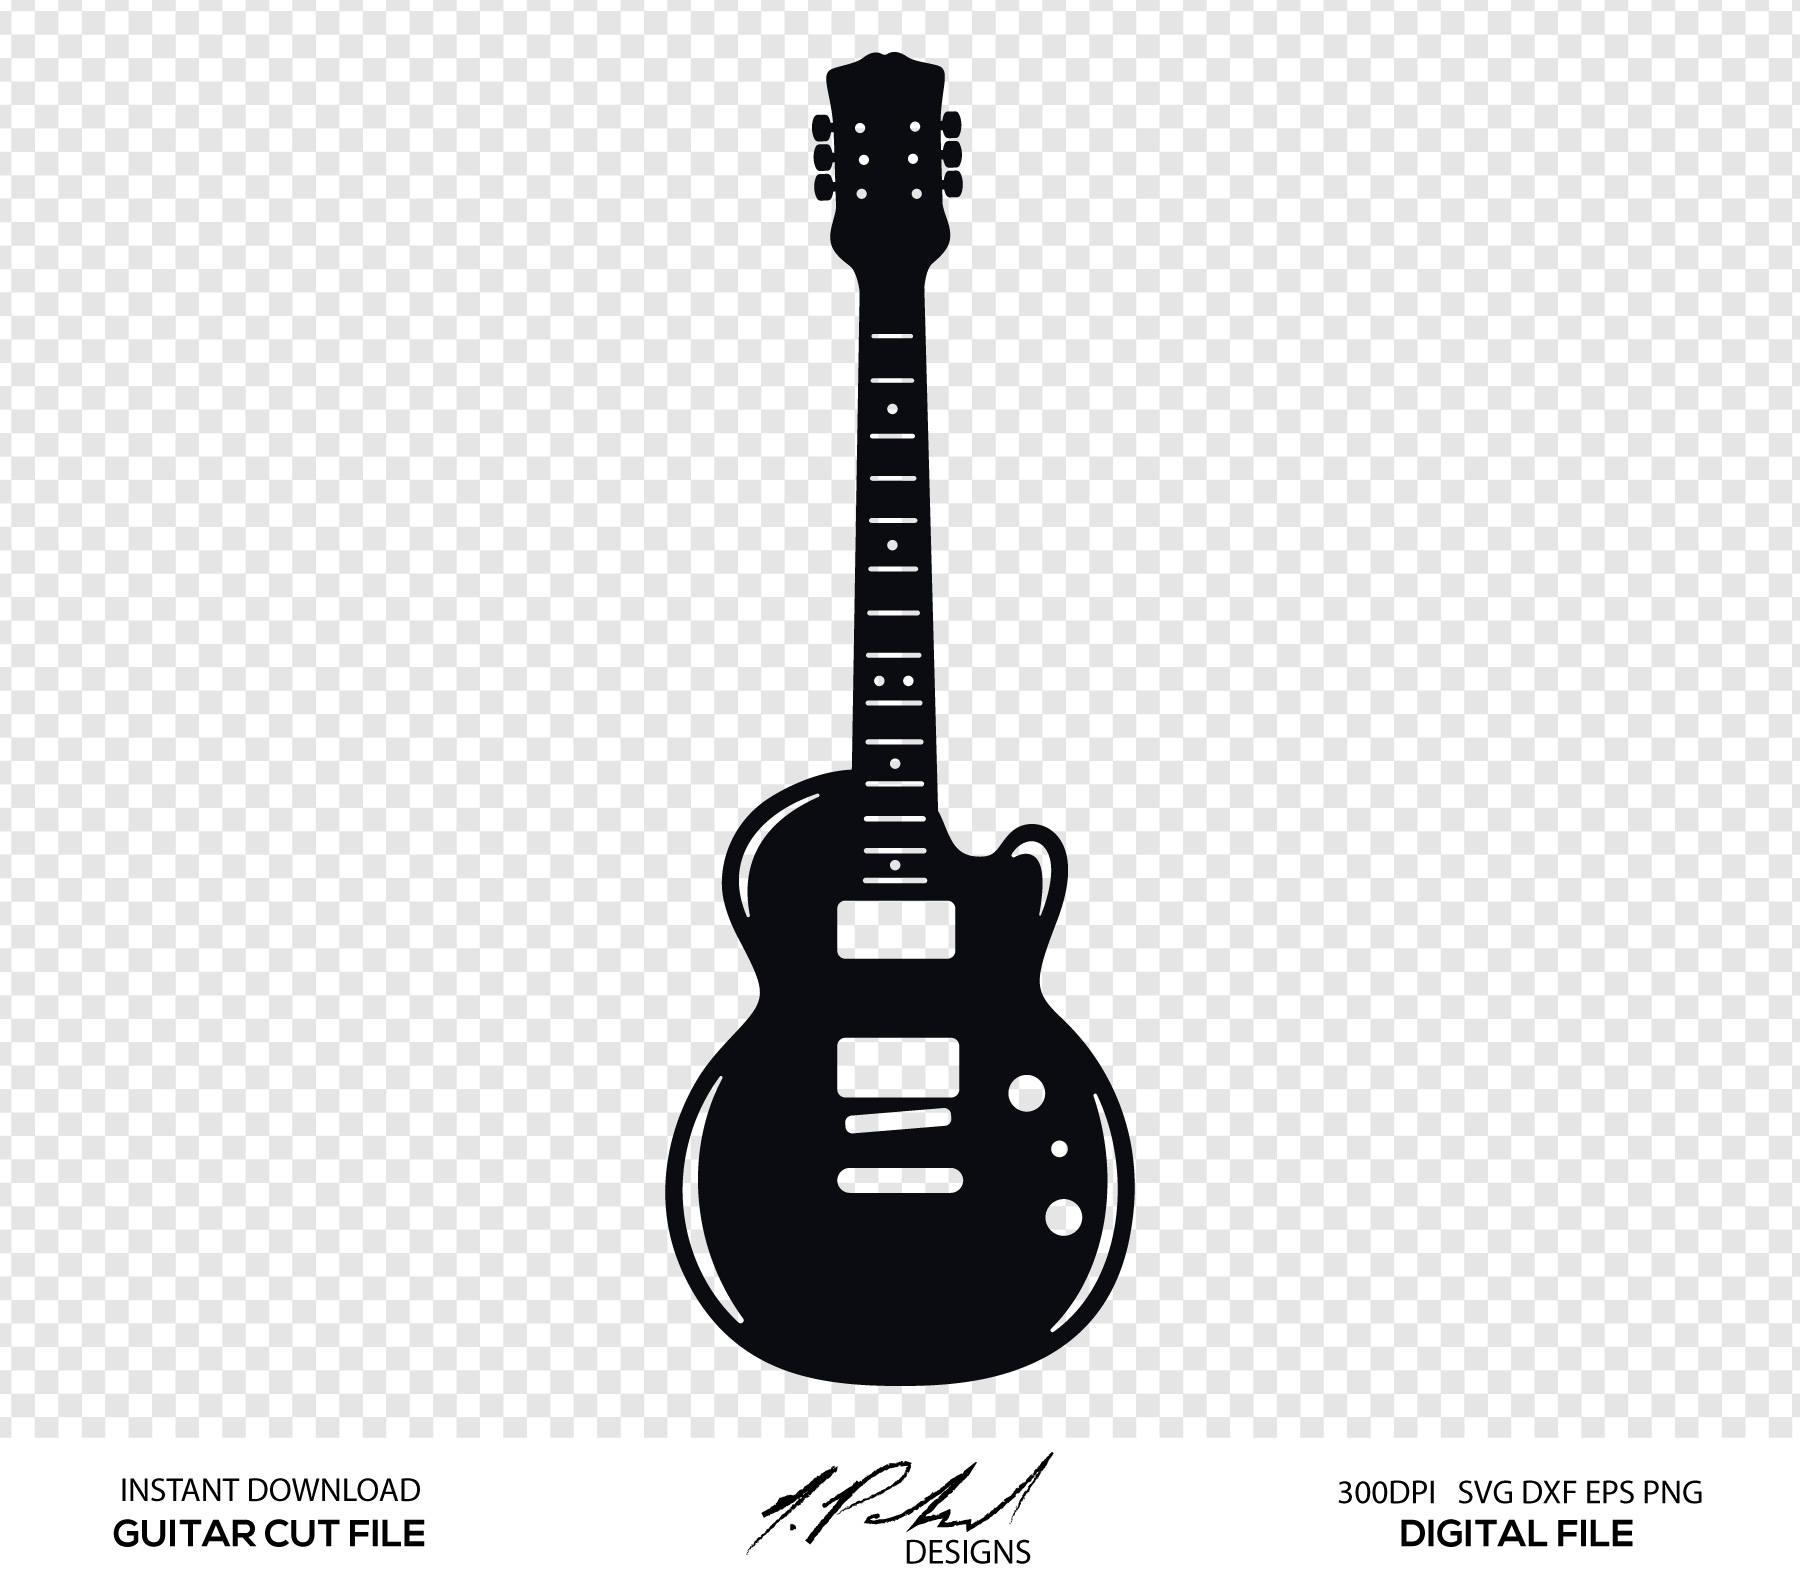 Guitar Cut File.